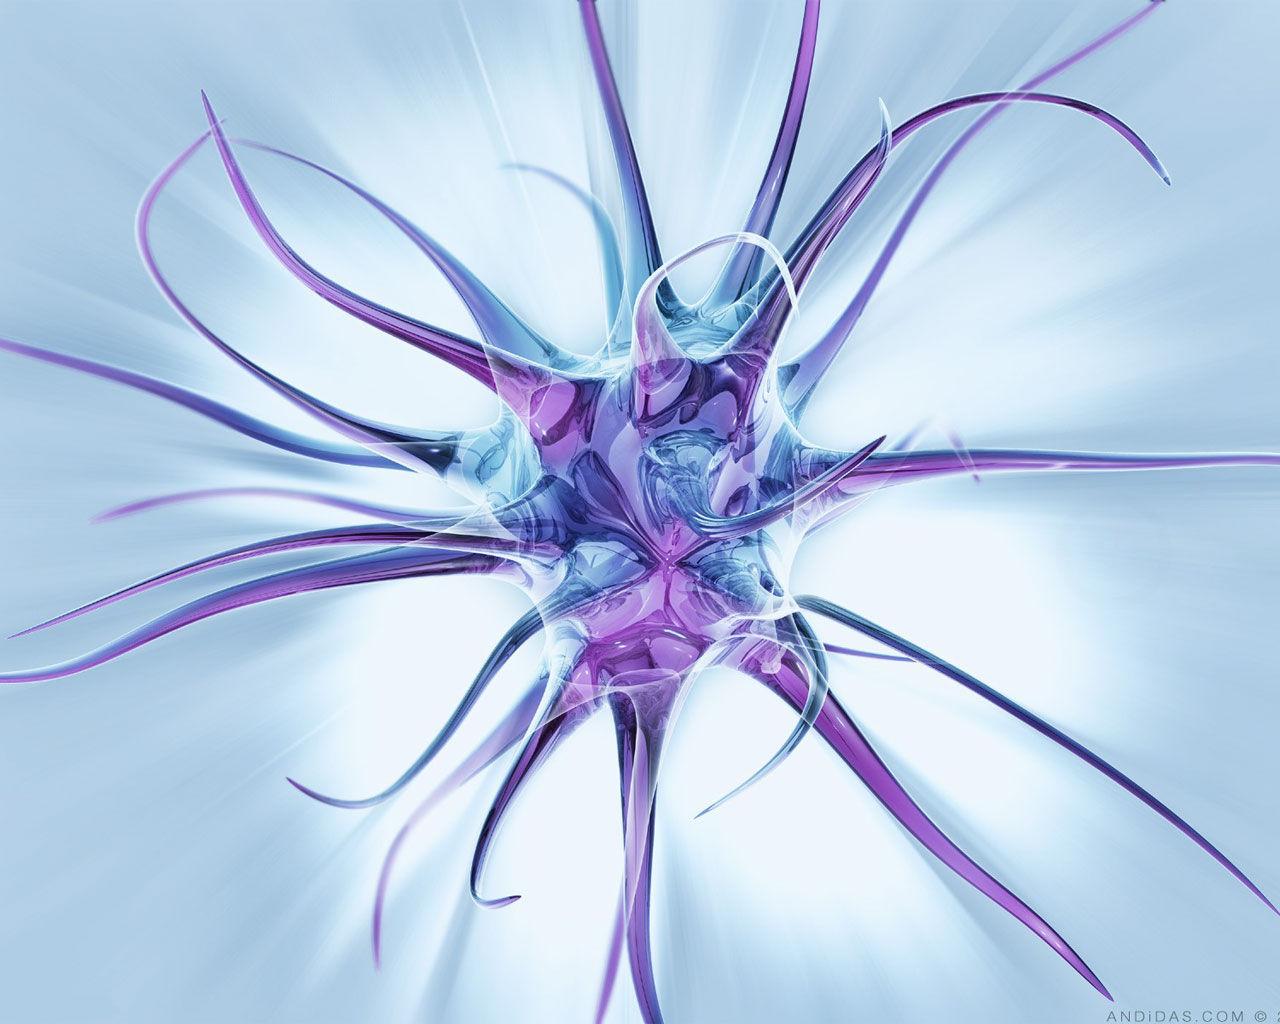 gotasdeduchacida: Gotas de neuronas obsesivas